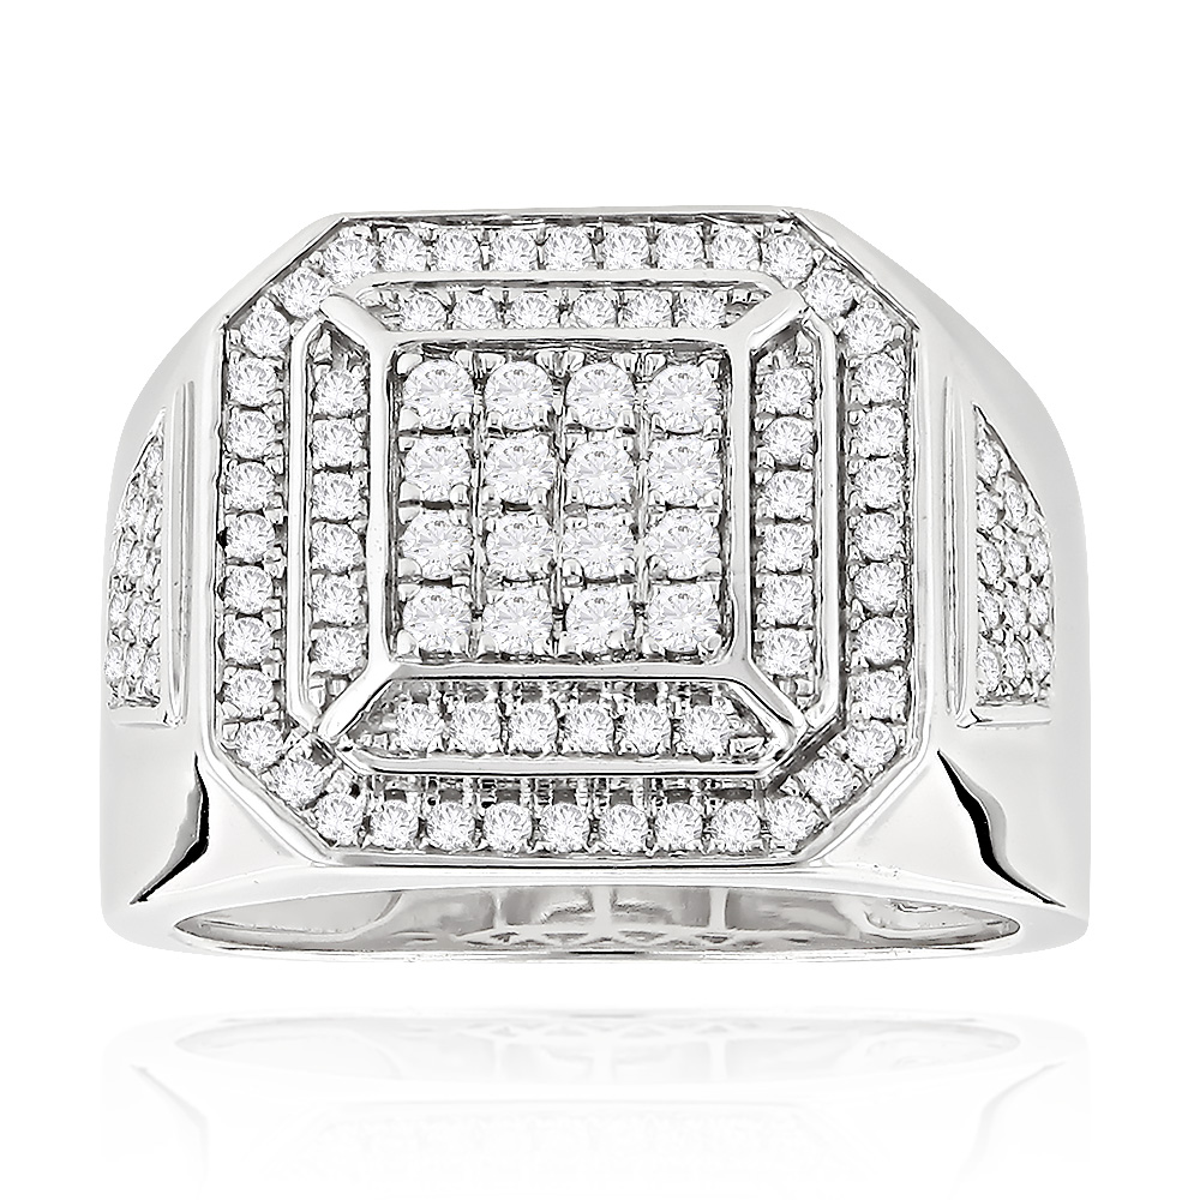 Mens Diamond Pinky Ring by Luxurman 1 Carat 14k Gold